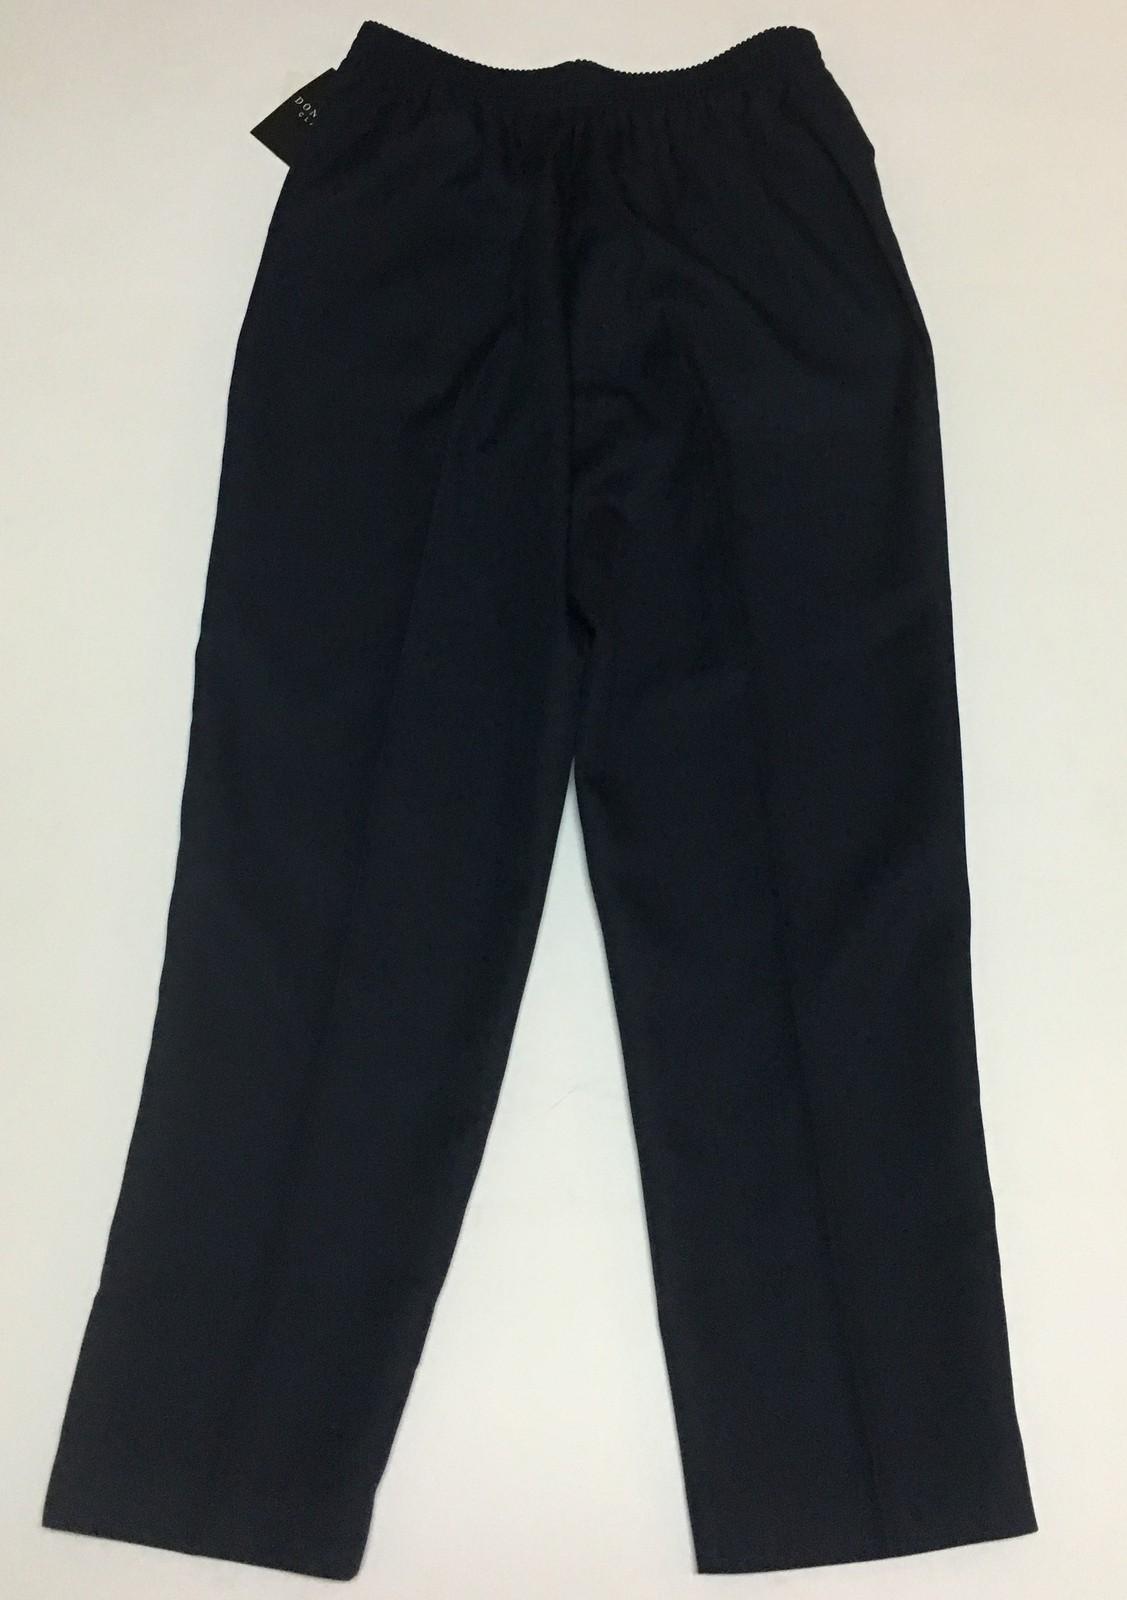 Donn Kenny Classic Navy Blue Pants Casual Elastic Comfort Waist Sz 12 Short NWT